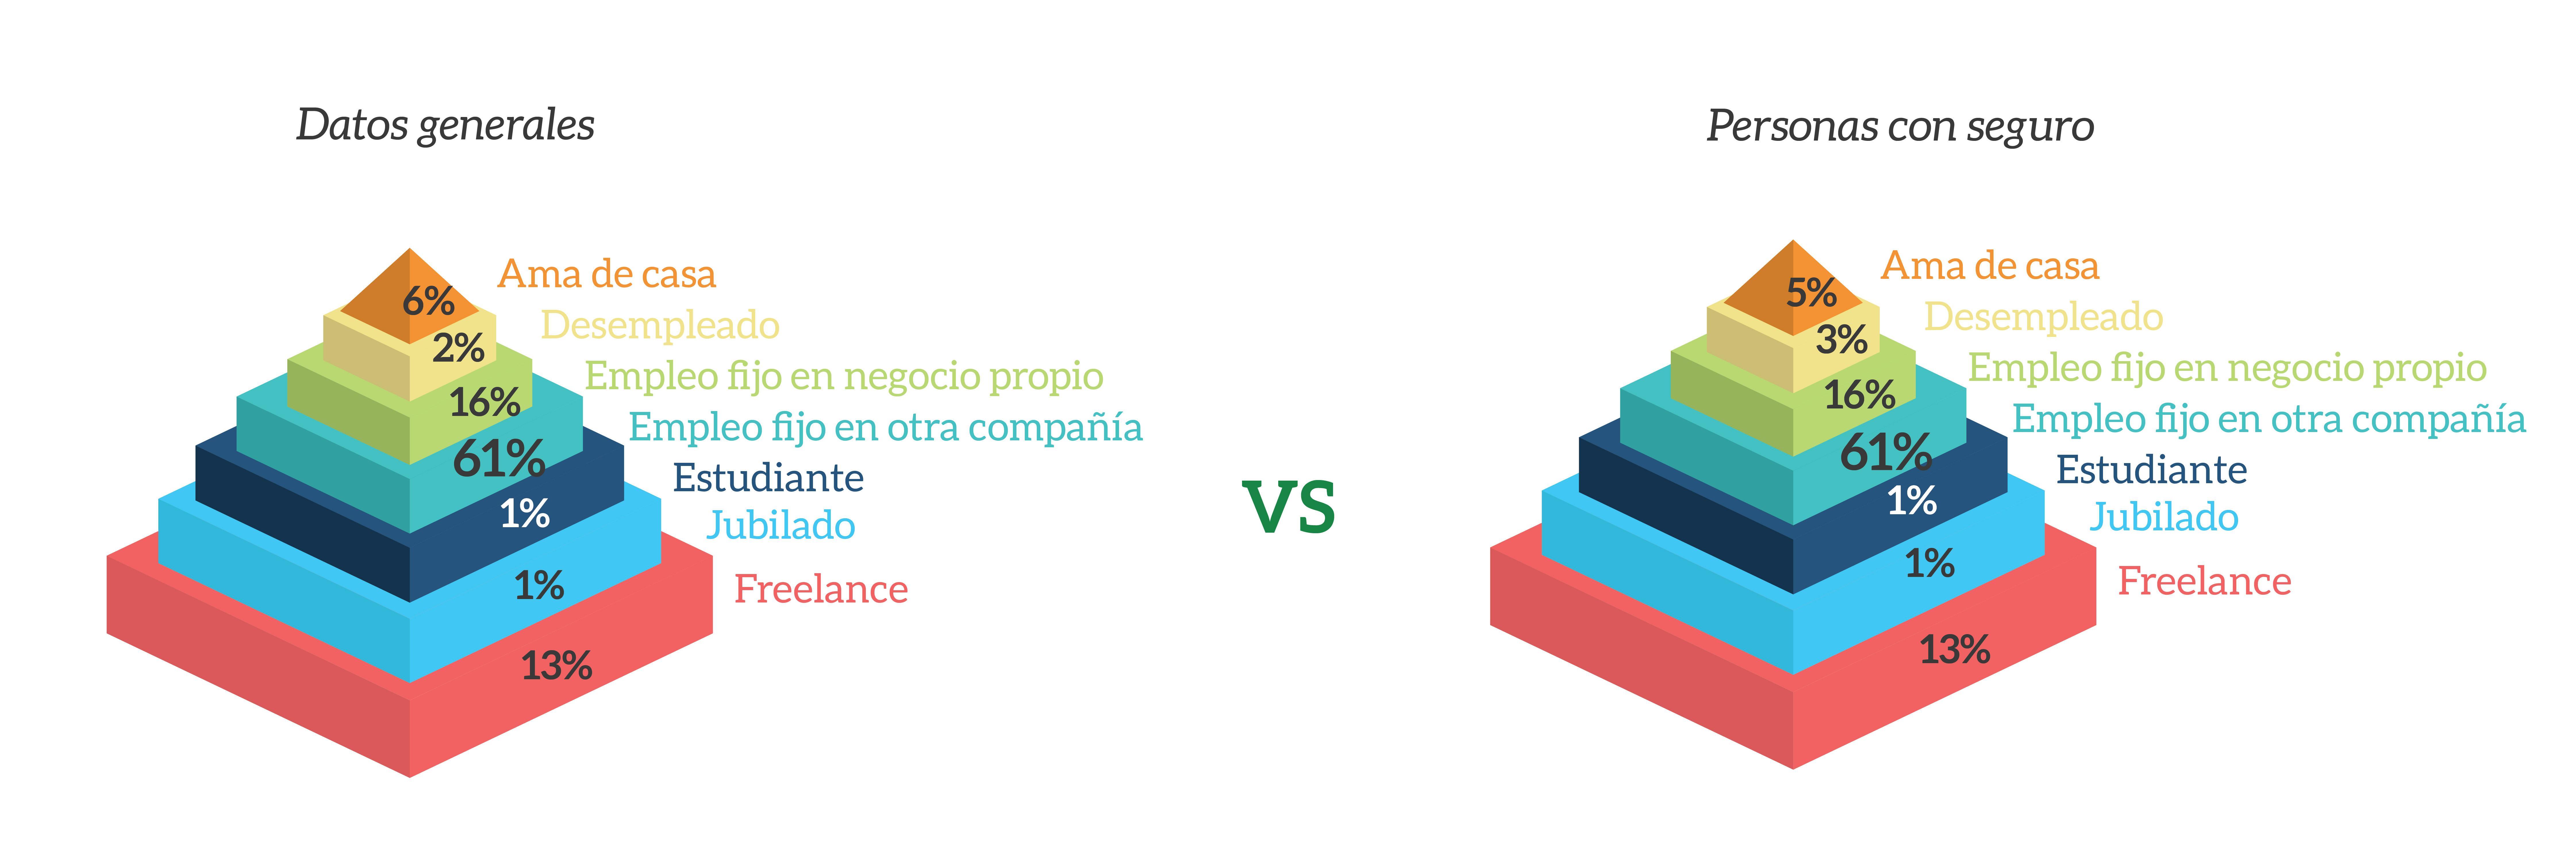 comparacion-ocupacion